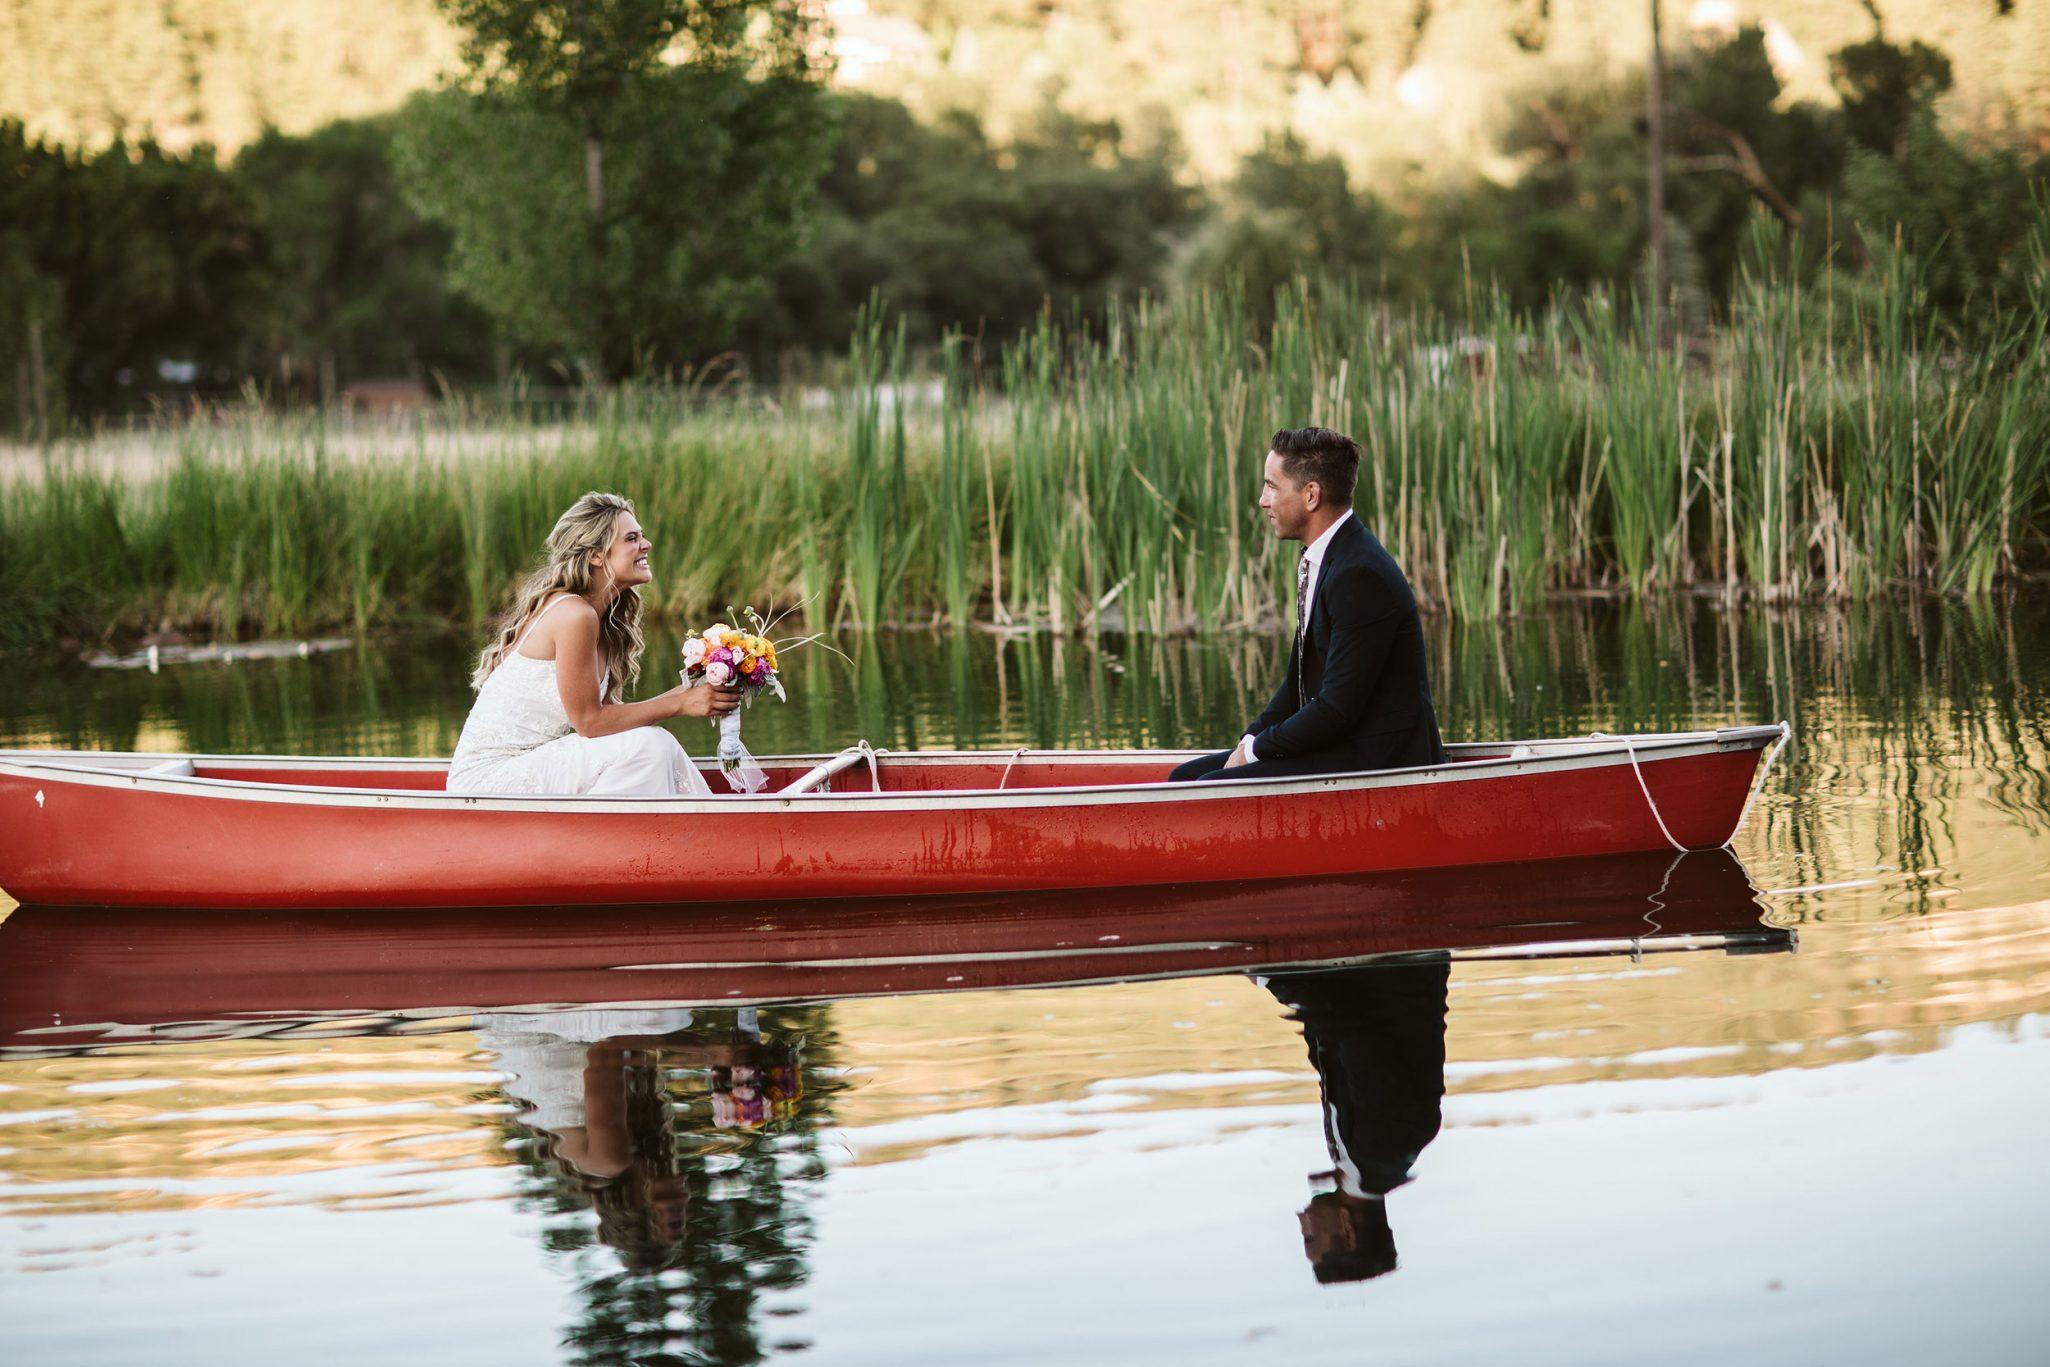 Bride + Groom + canoe